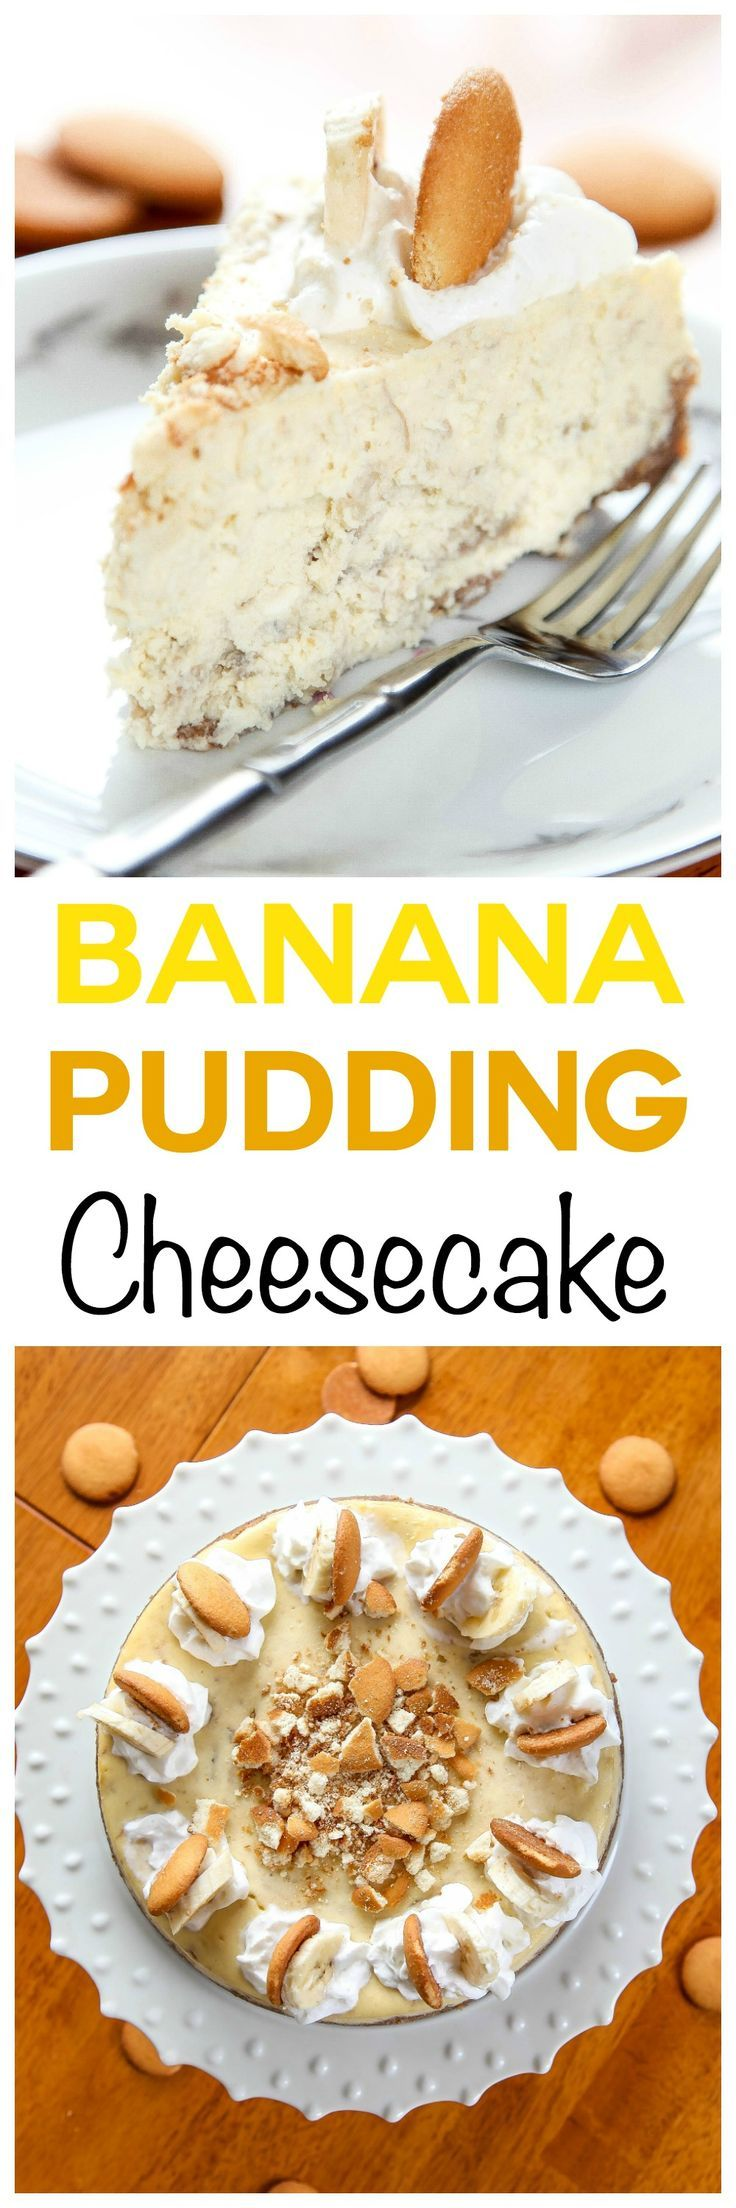 Banana Pudding Cheesecake: Silky smooth banana cheesecake nestled inside a vanilla wafer crust. Tastes like banana pudding in cheesecake form!